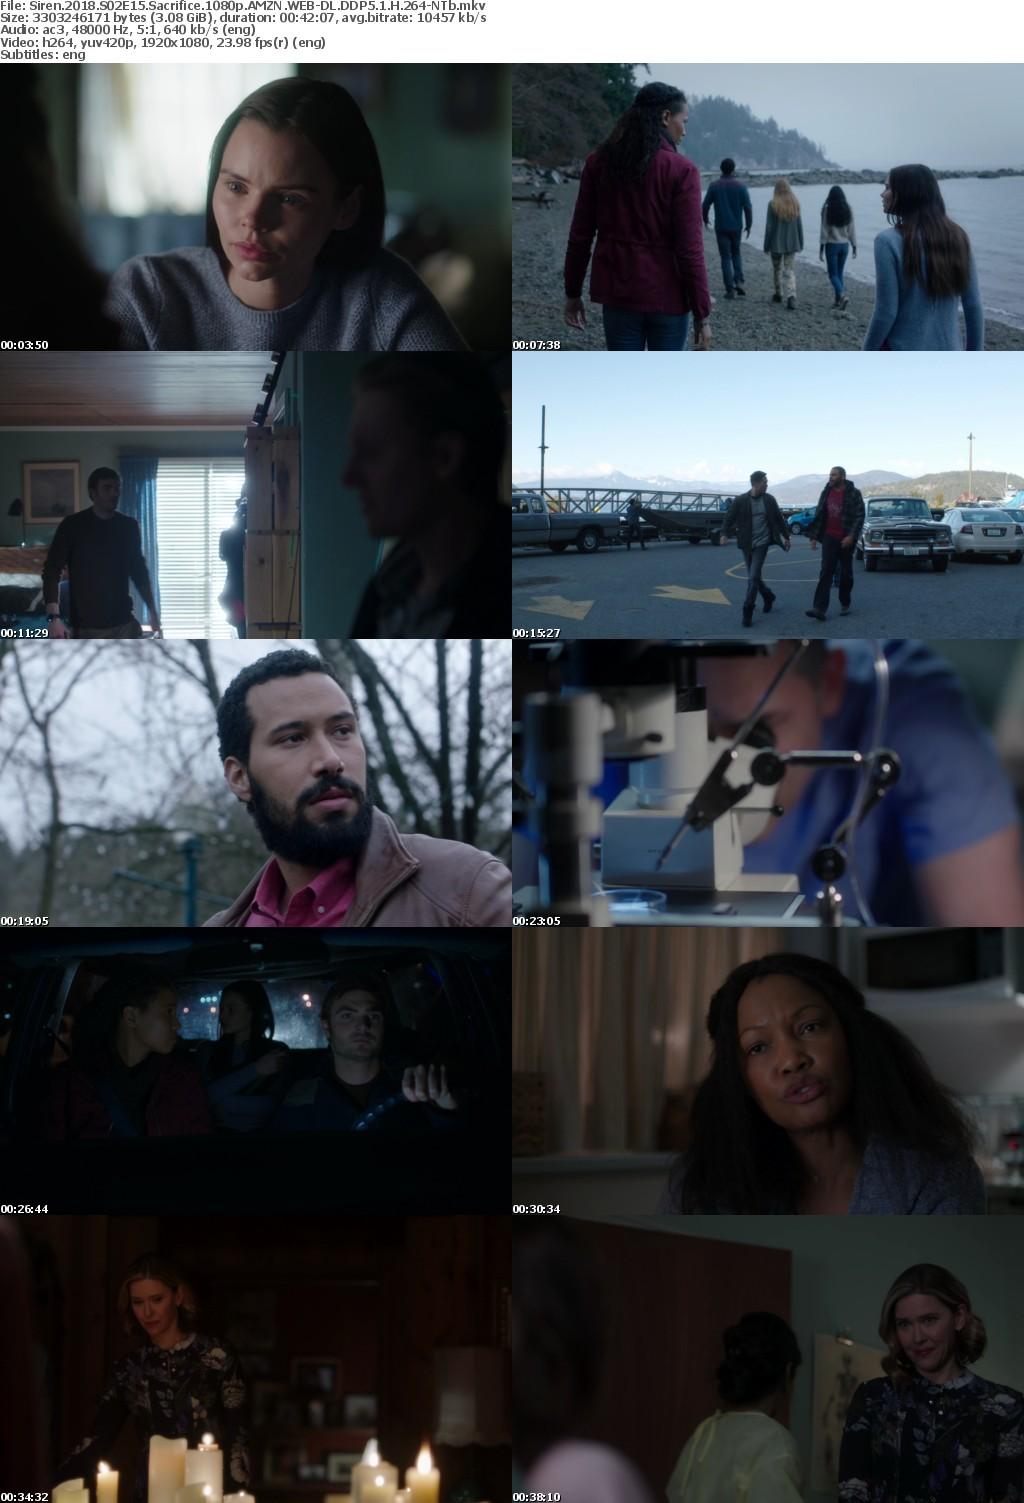 Siren 2018 S02E15 Sacrifice 1080p AMZN WEB-DL DDP5 1 H 264-NTb